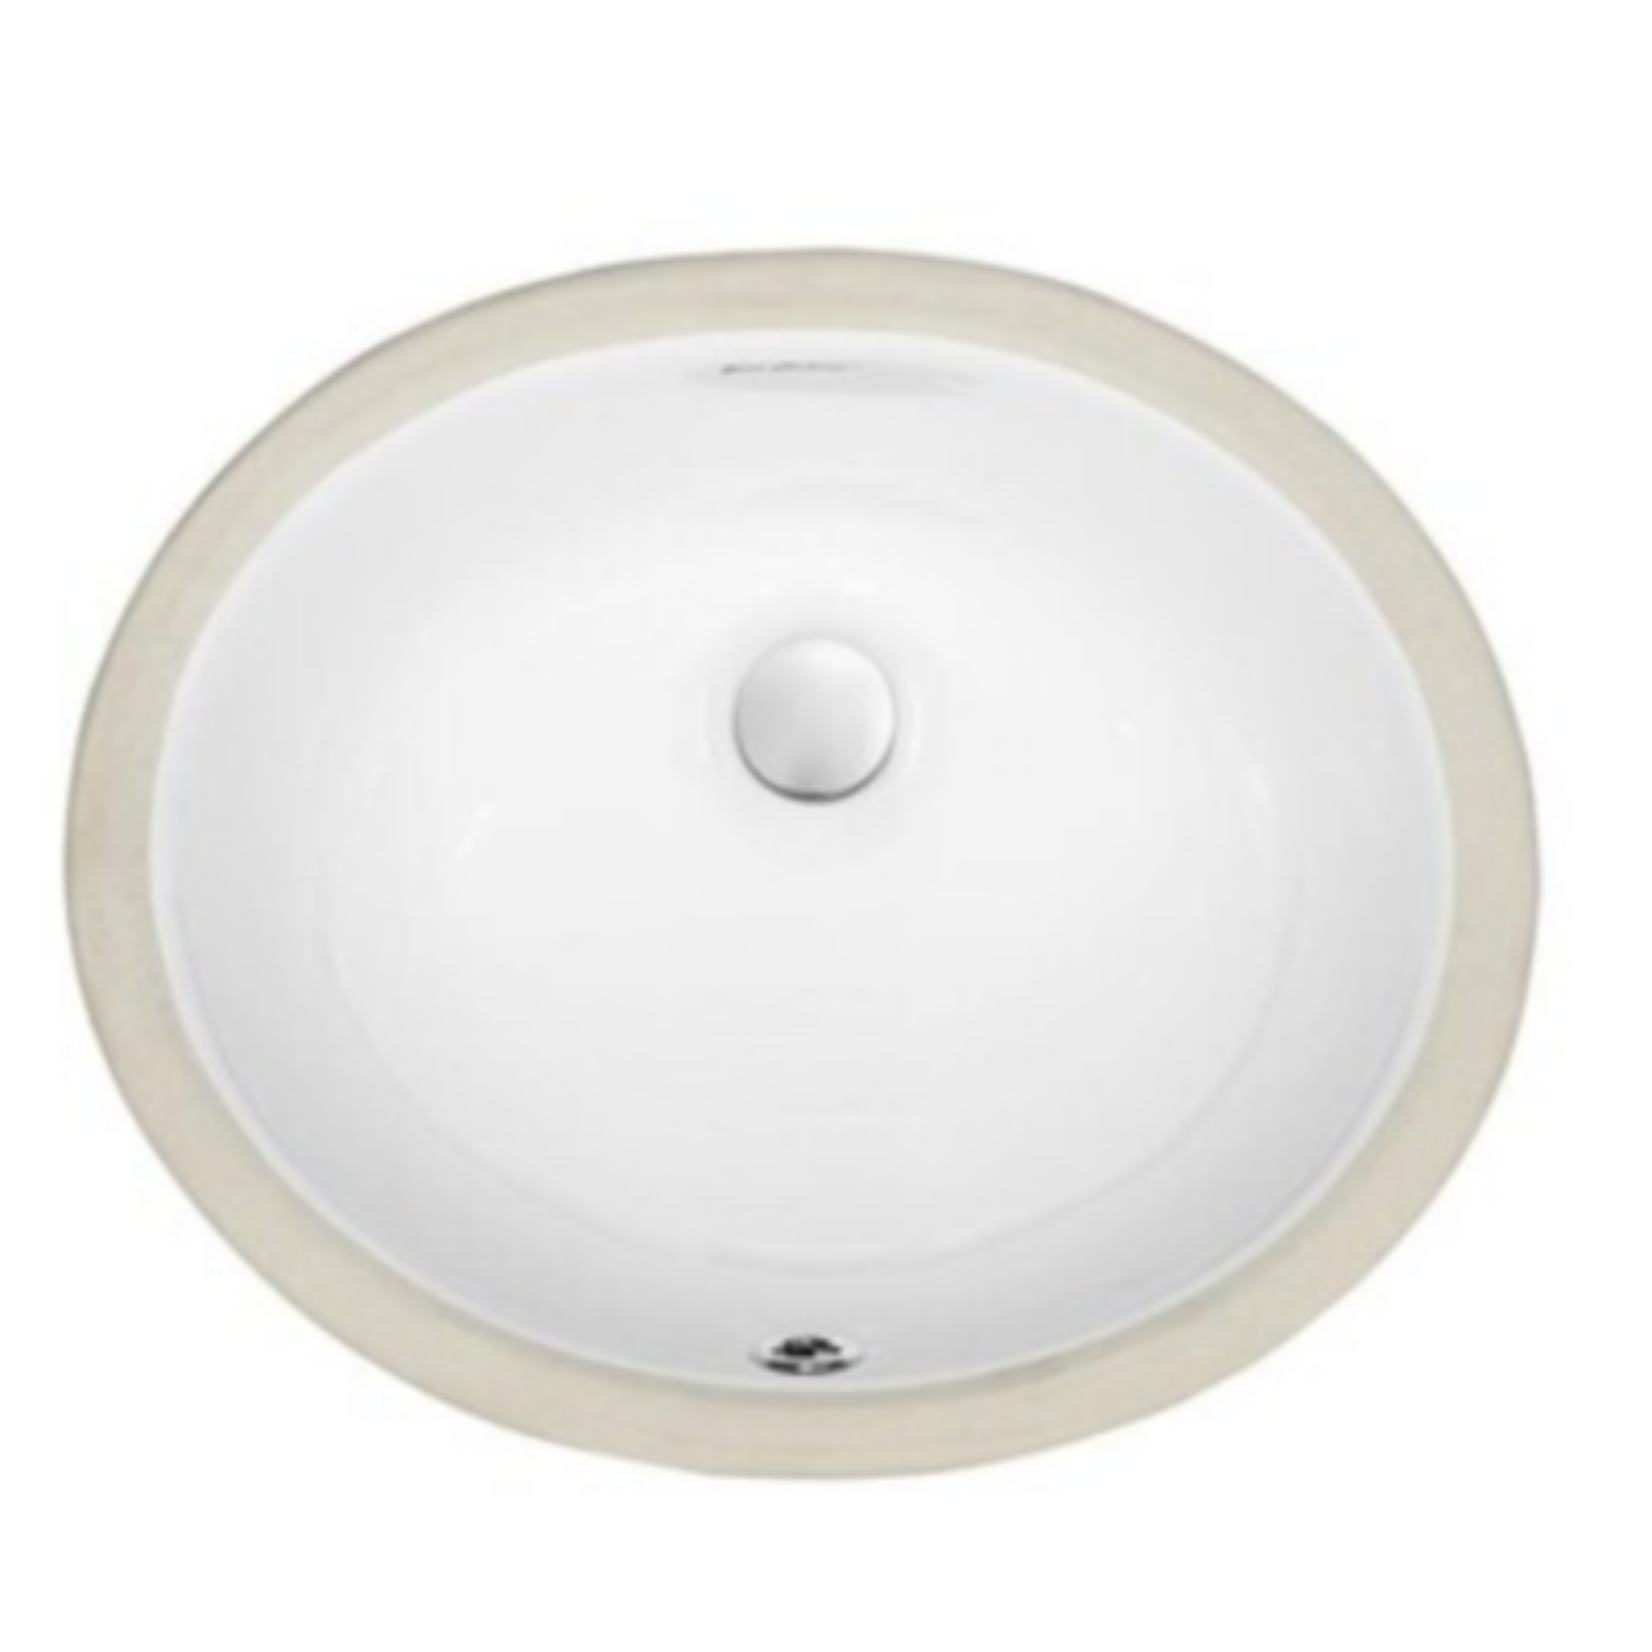 2850 Swiss Madison Plaisir Glossy White Ceramic Undermount Sink